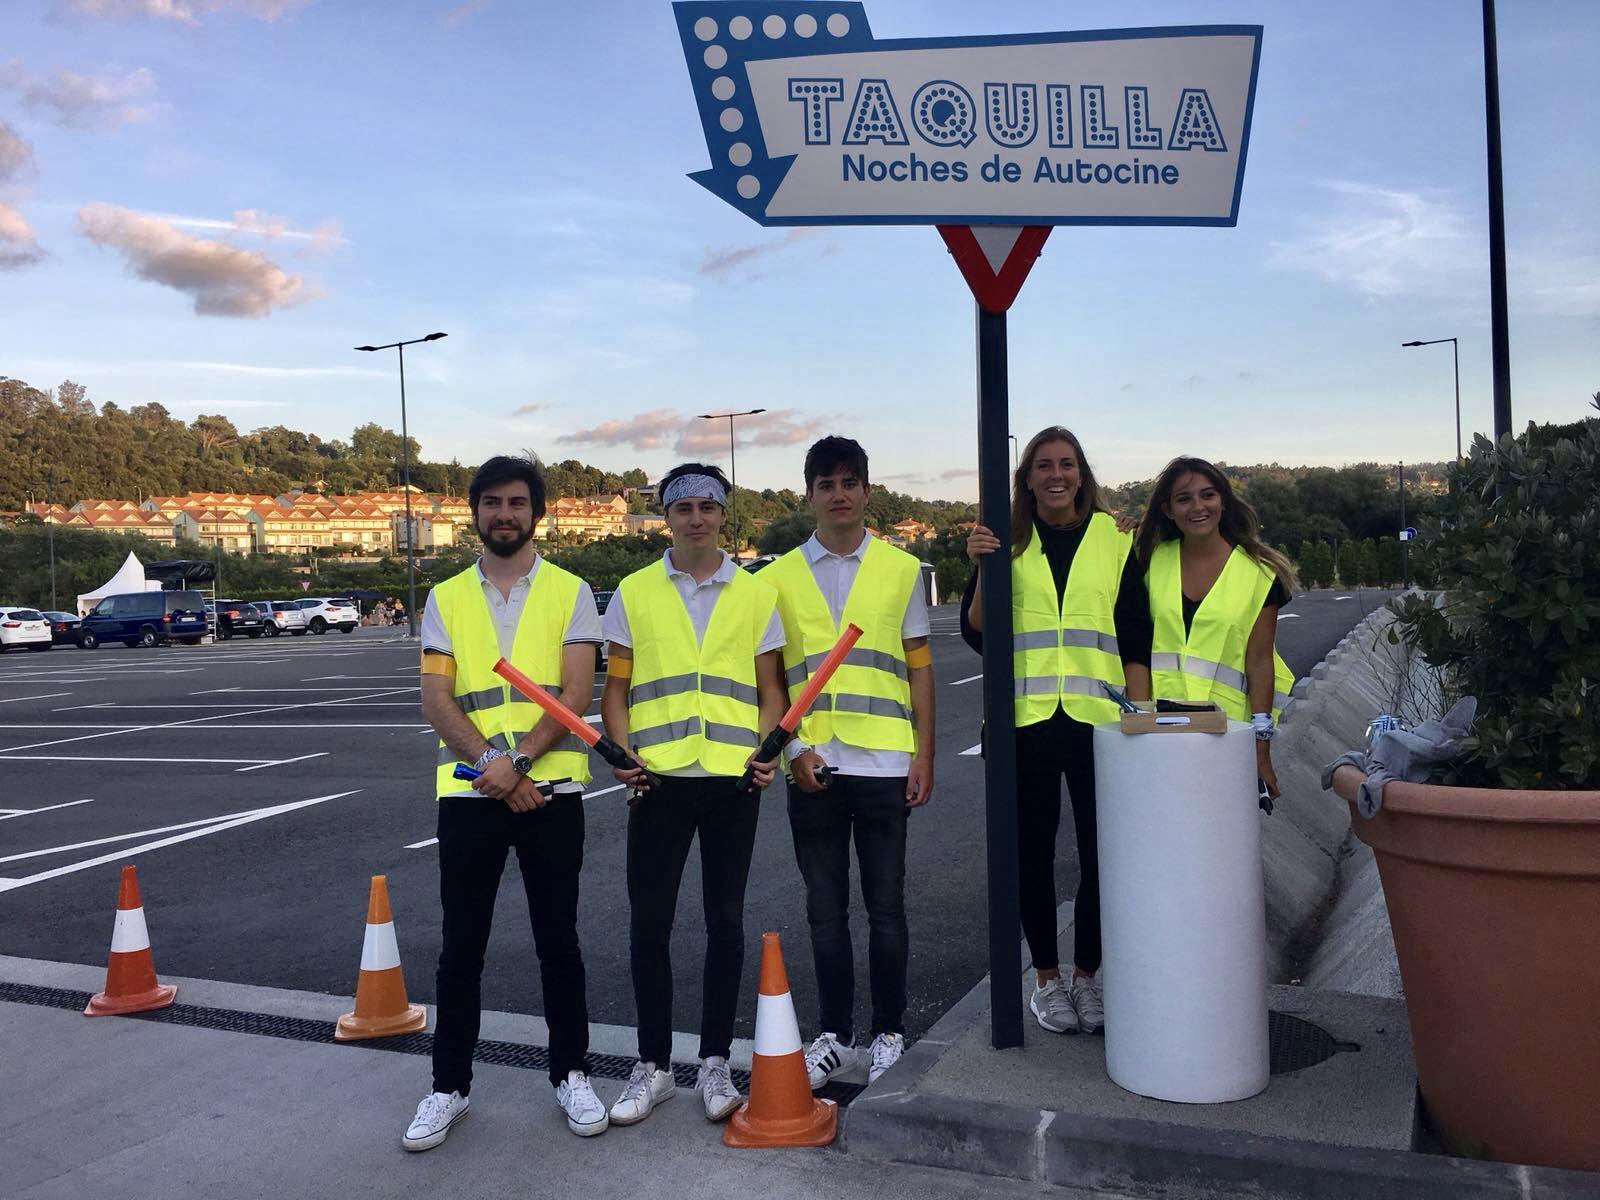 CORUÑA THE STYLE OUTLETS VUELVE A PONER EN MARCHA LA CAMPAÑA 'NOCHES DE AUTOCINE'